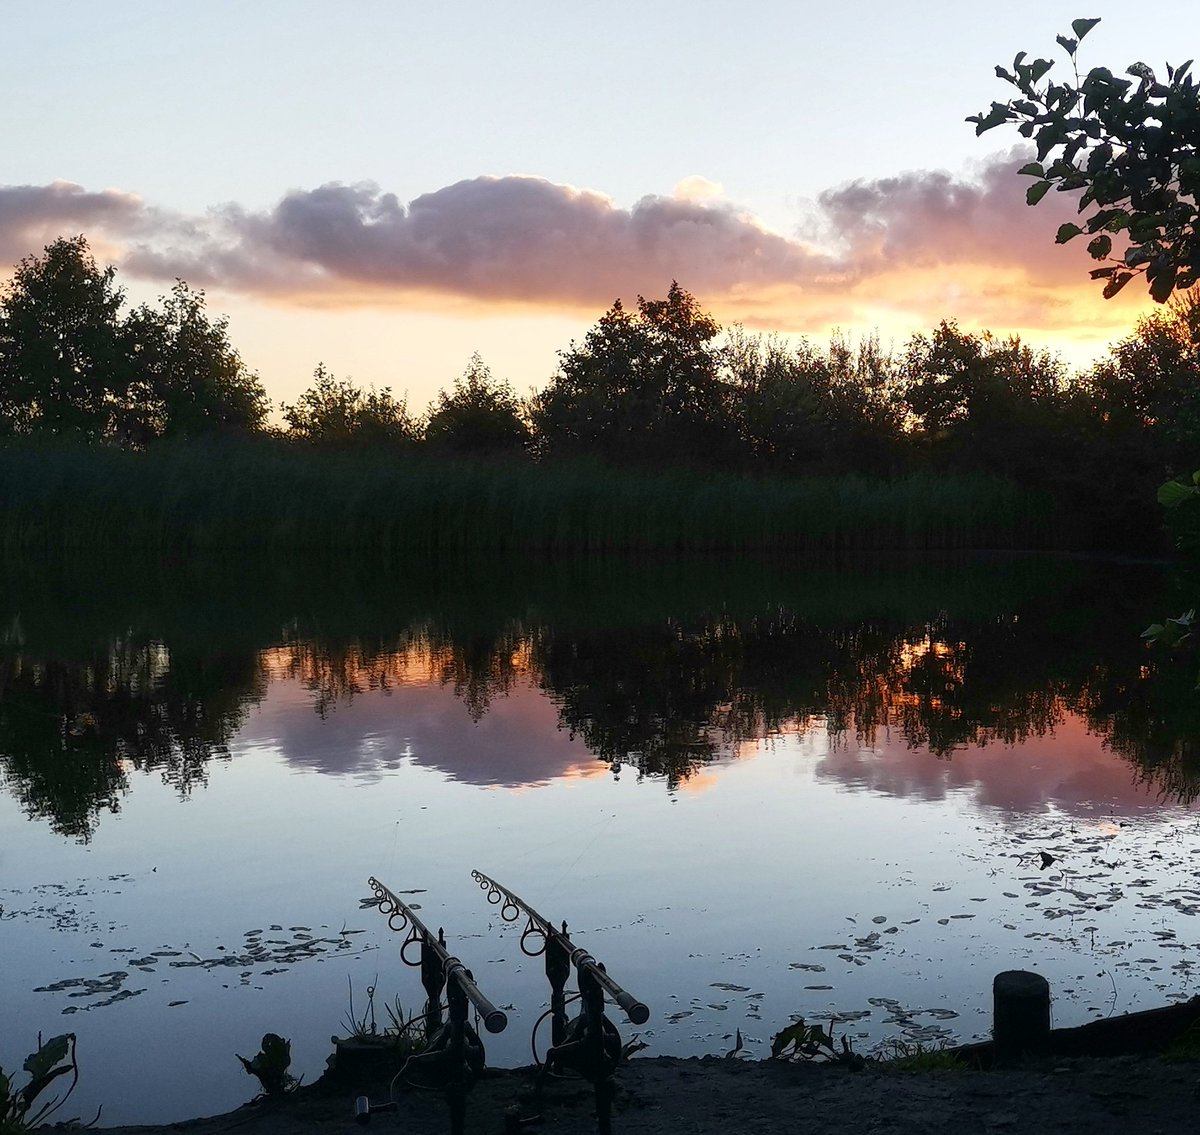 Carp fishing last <b>Summer</b>, sunrise on a lake can be magical 😍  #carpfishing #sunrise #fishi